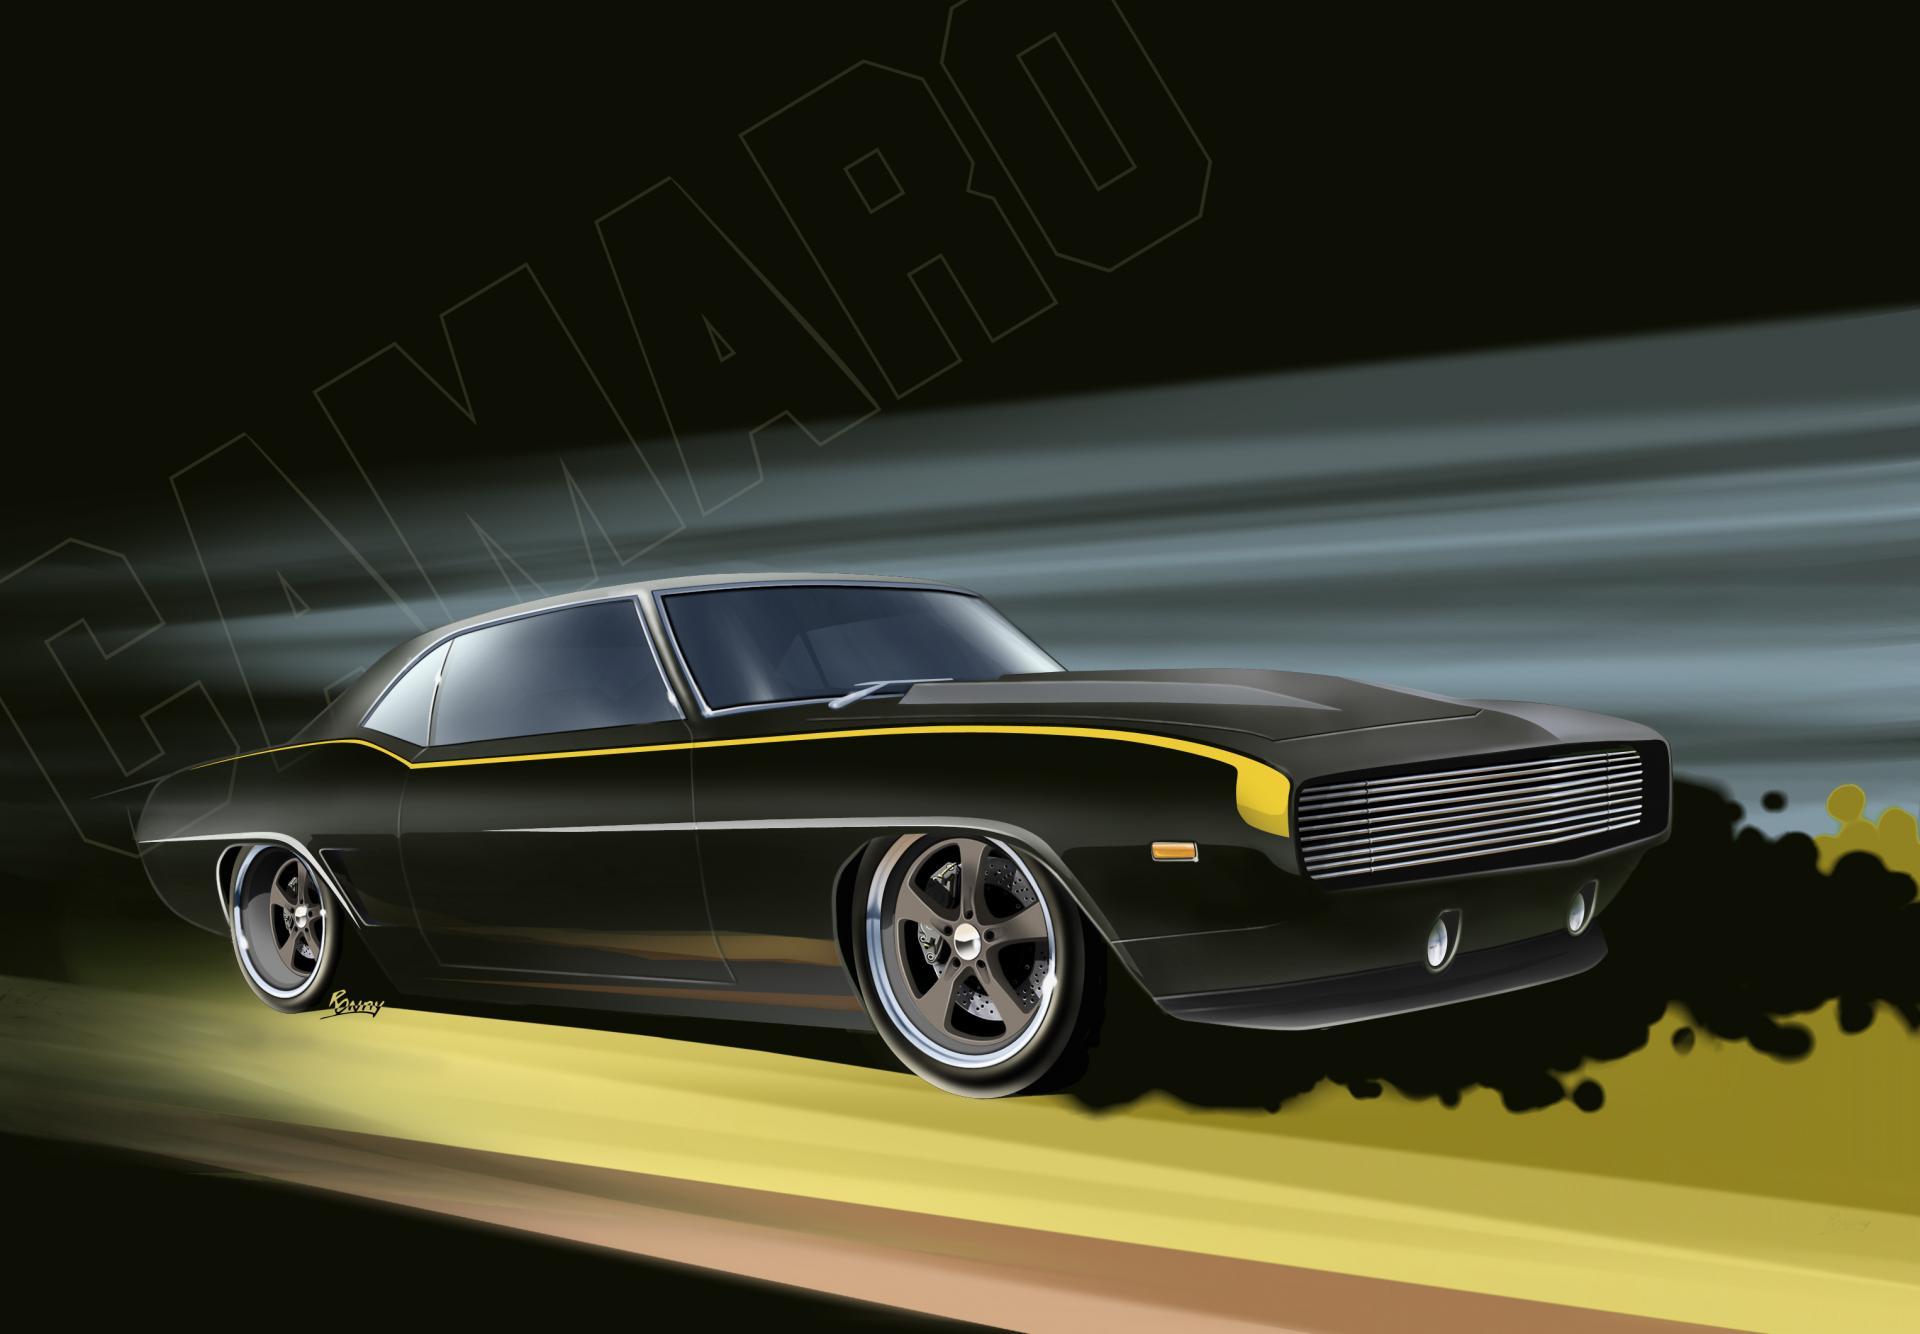 1969_Chevrolet_Camaro black new wheel copy1.jpg